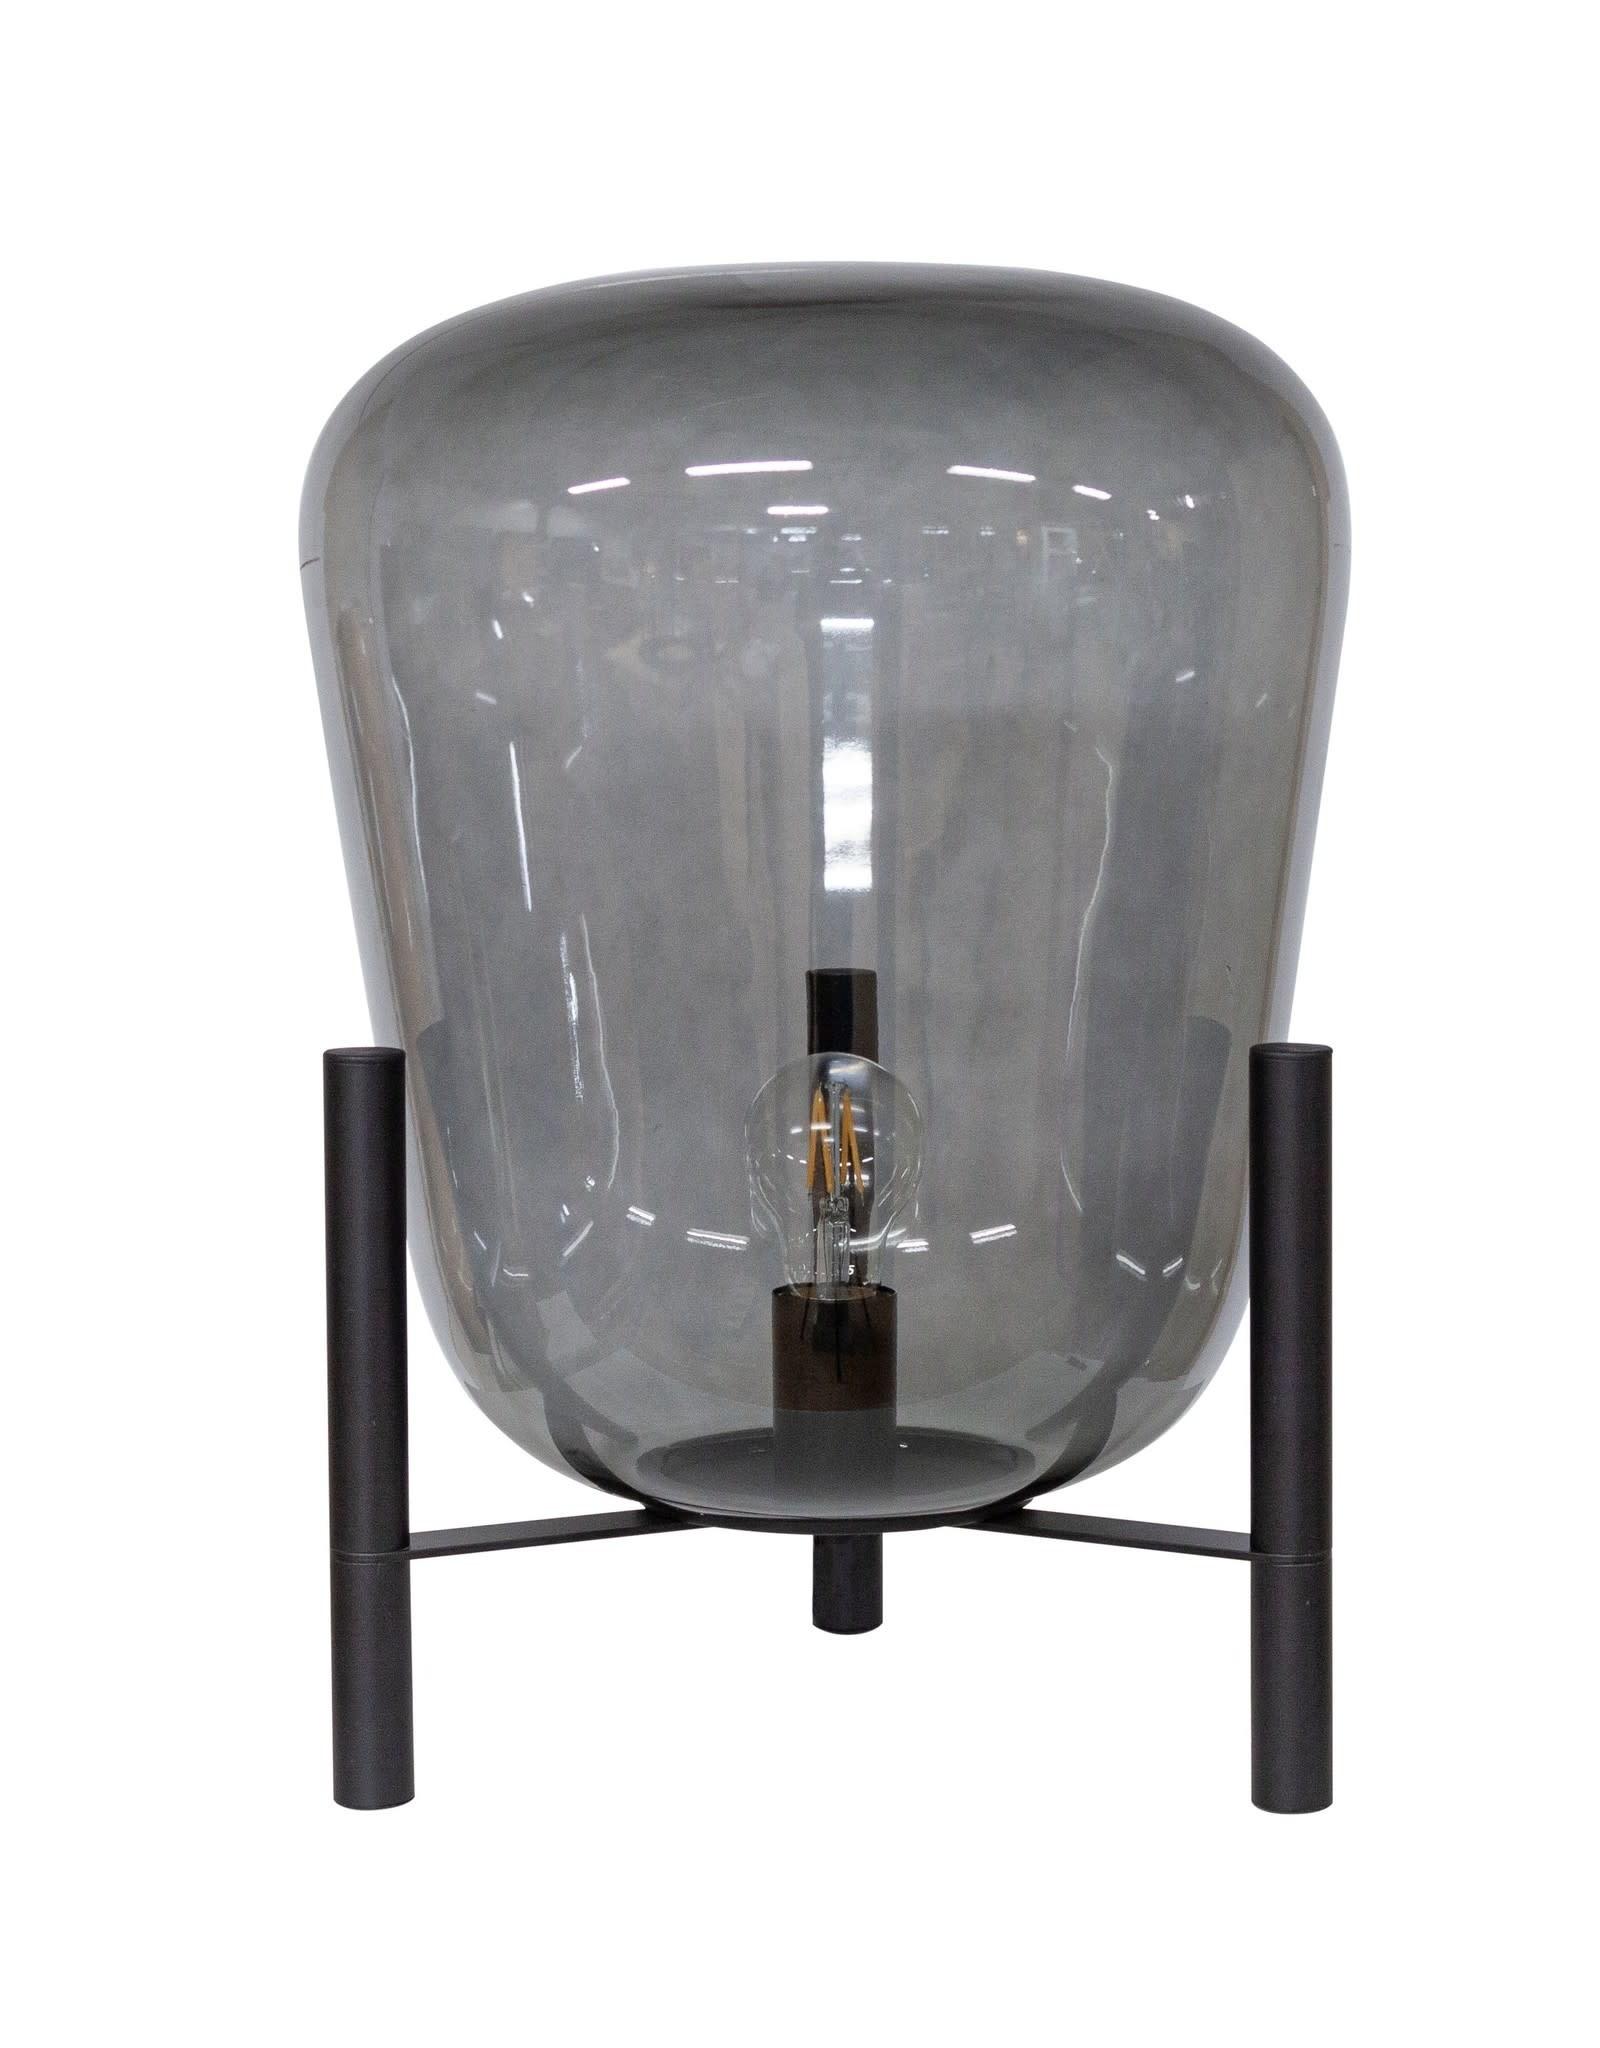 Dome Deco Dome Deco - Table/floor lamp